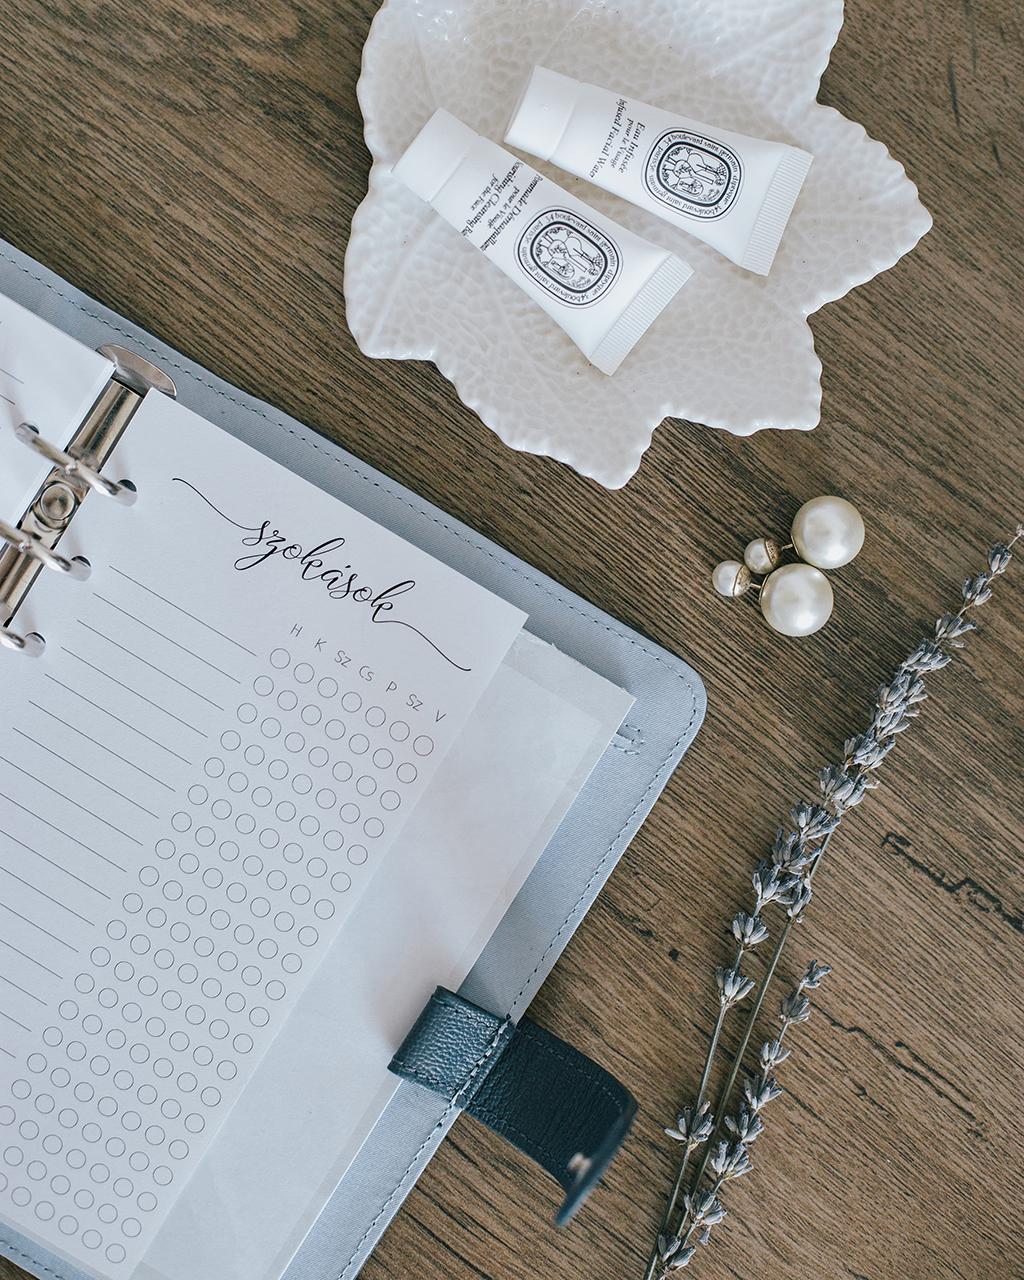 paperdice_planner_51